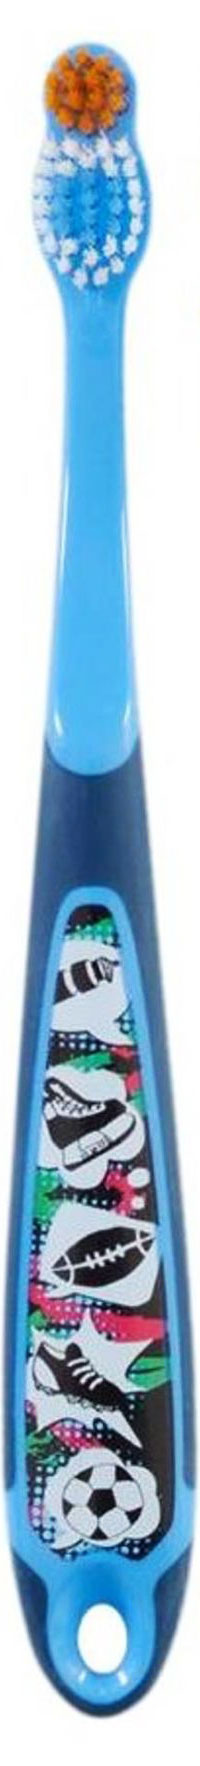 Jordan Οδοντόβουρτσα Mπλέ 6- 9 Ετών, 1 Τεμάχιο